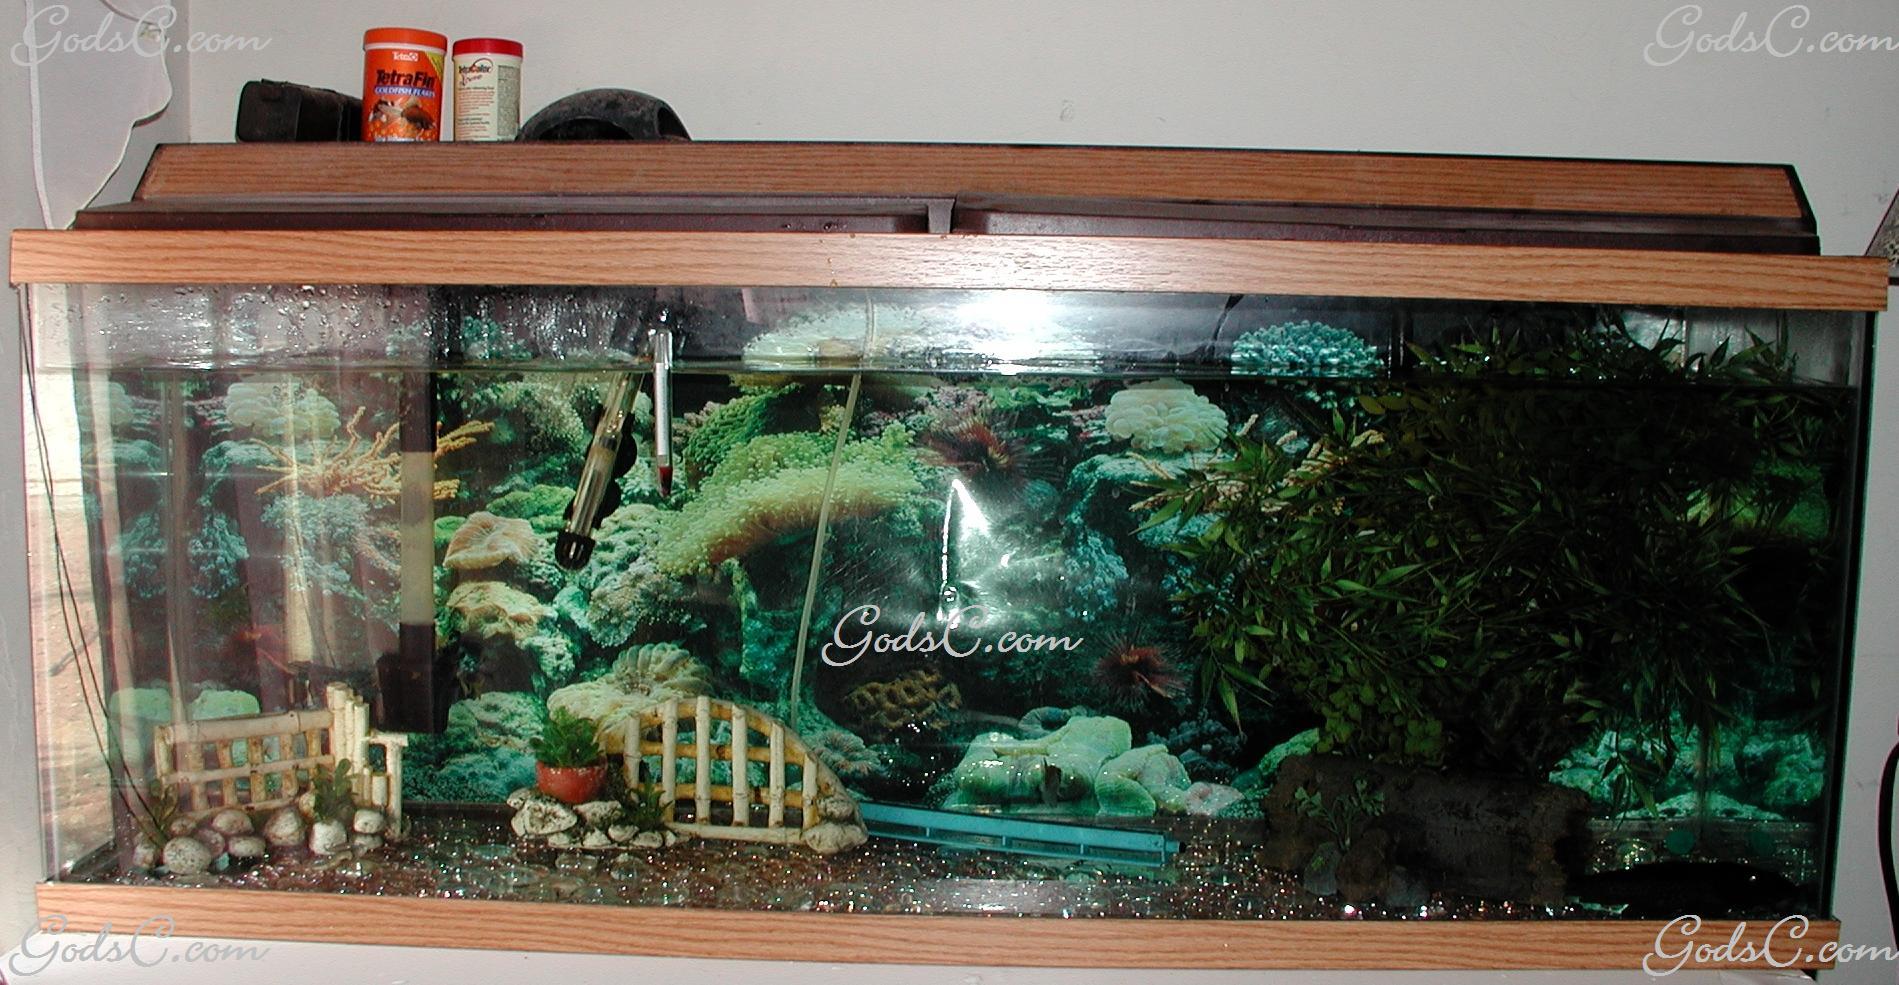 Freshwater fish for tanks - Bible